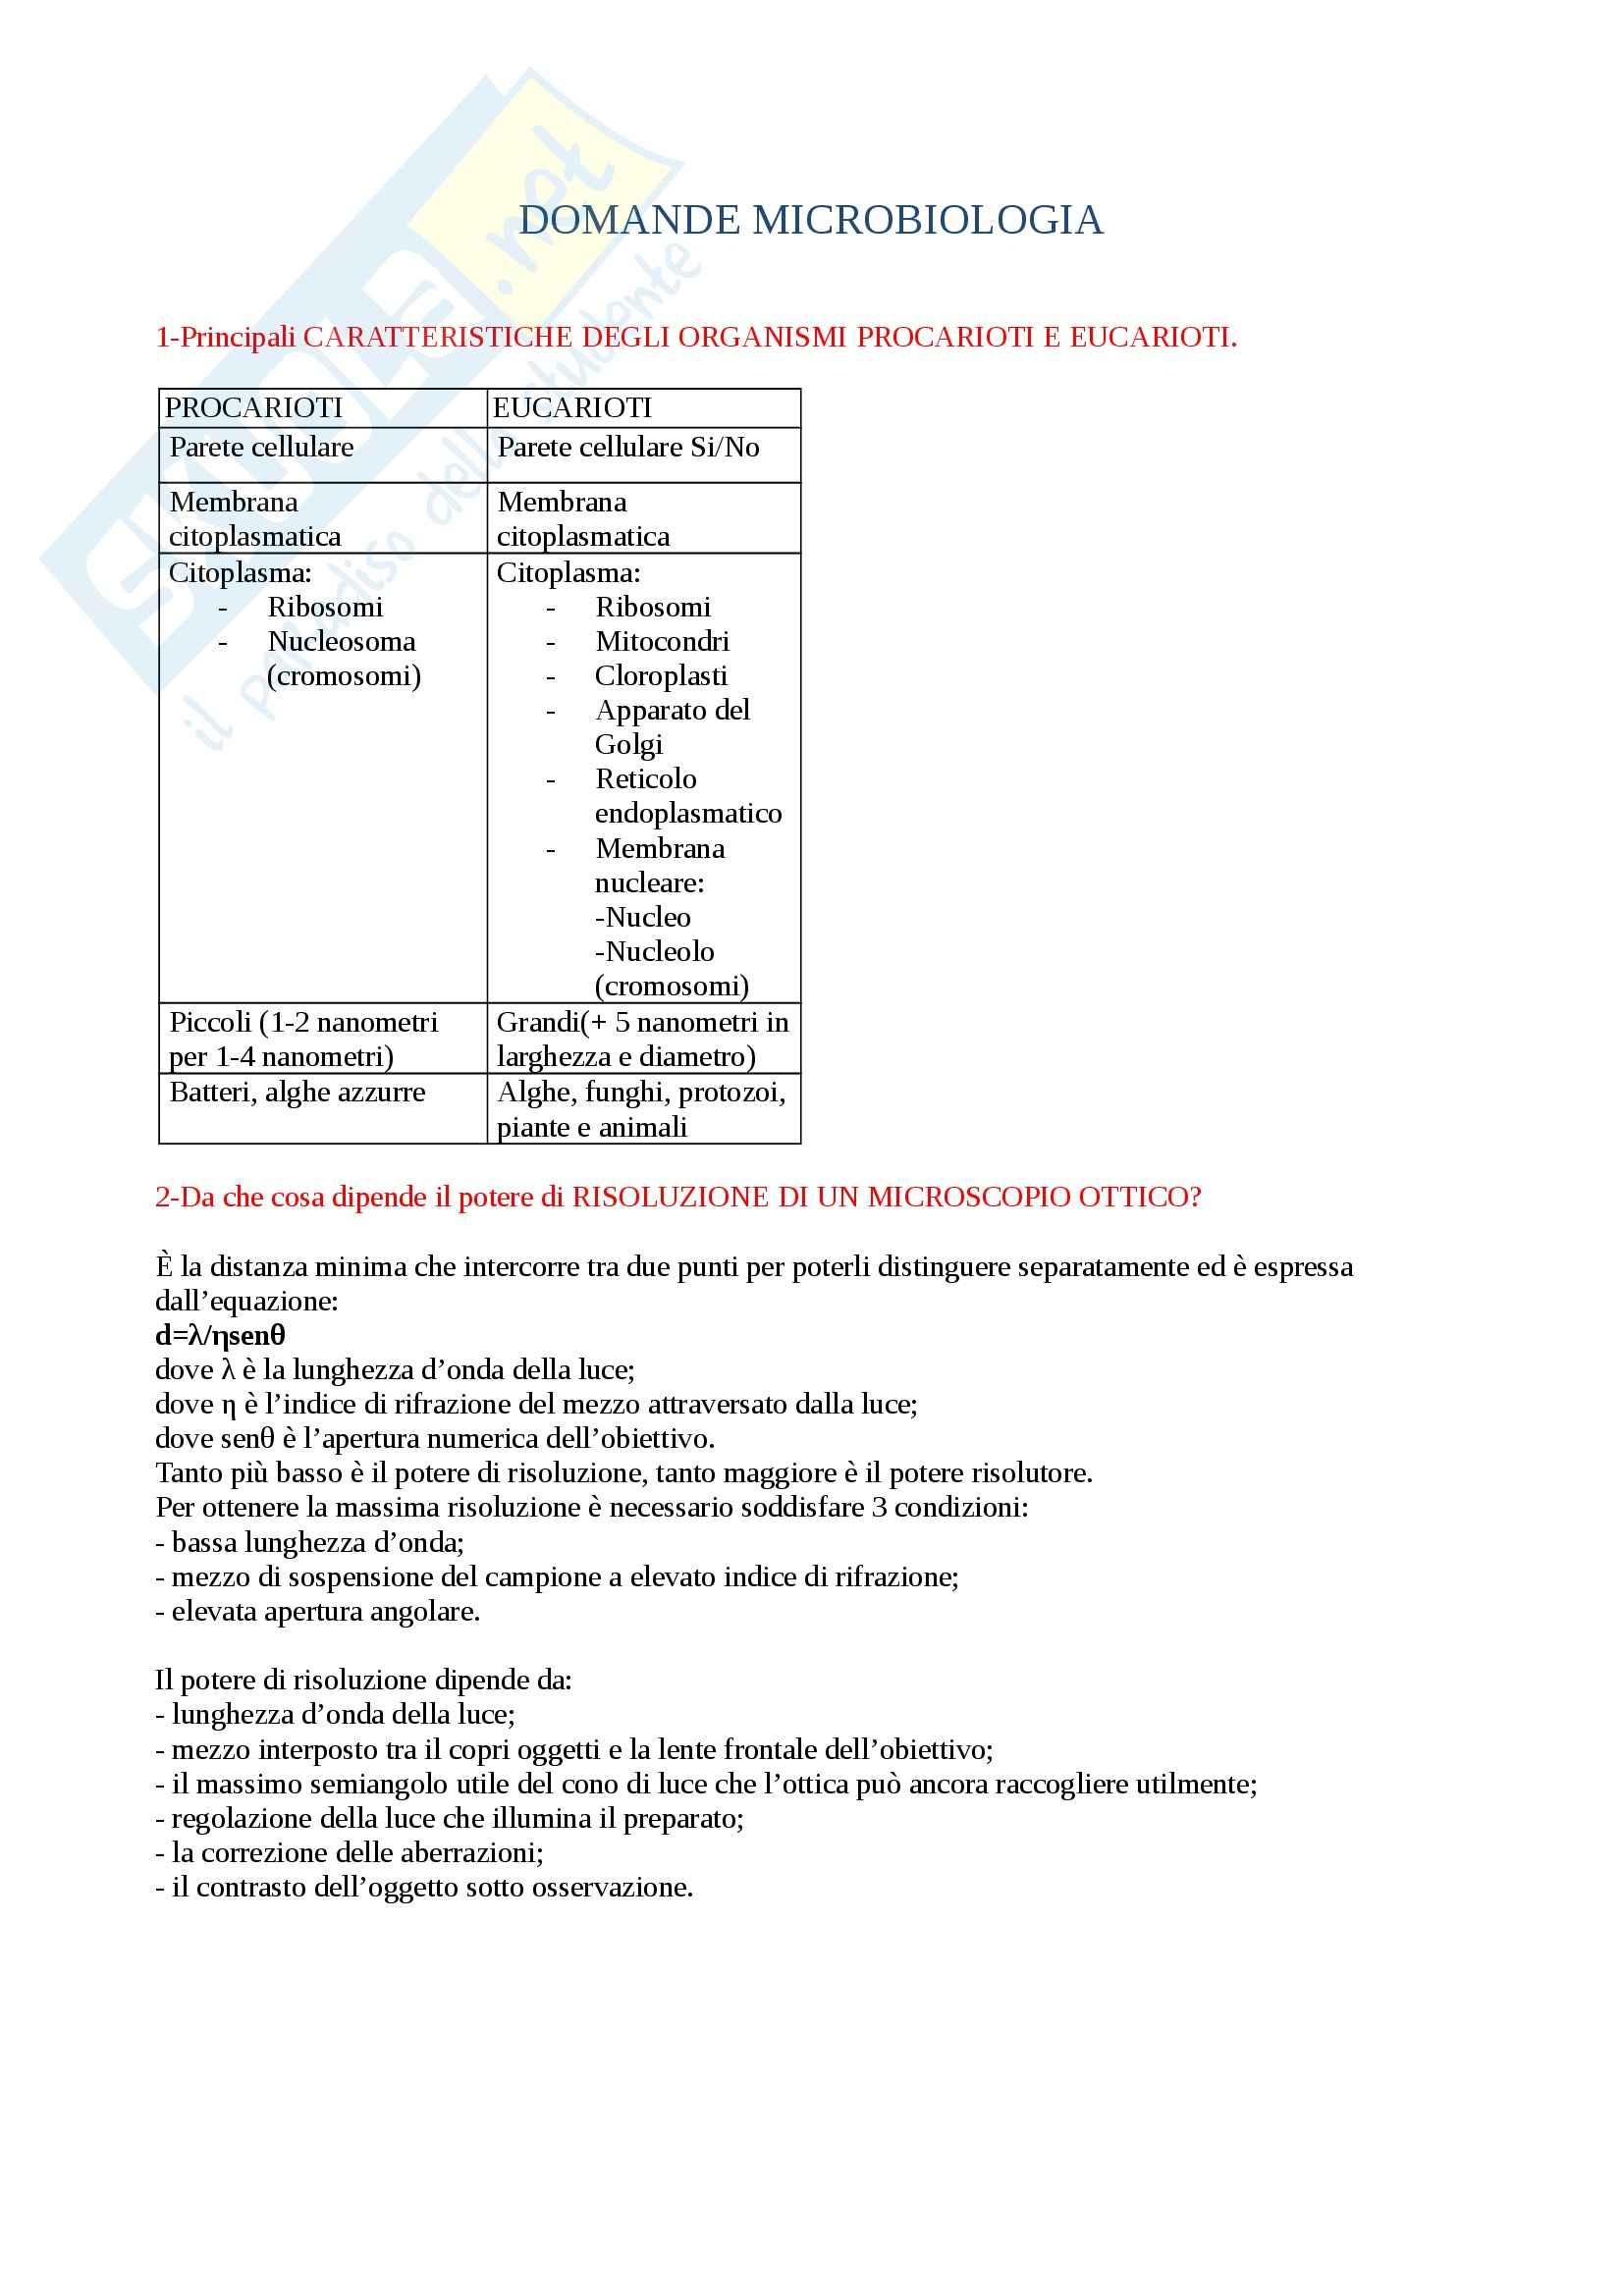 Microbiologia agraria - Domande